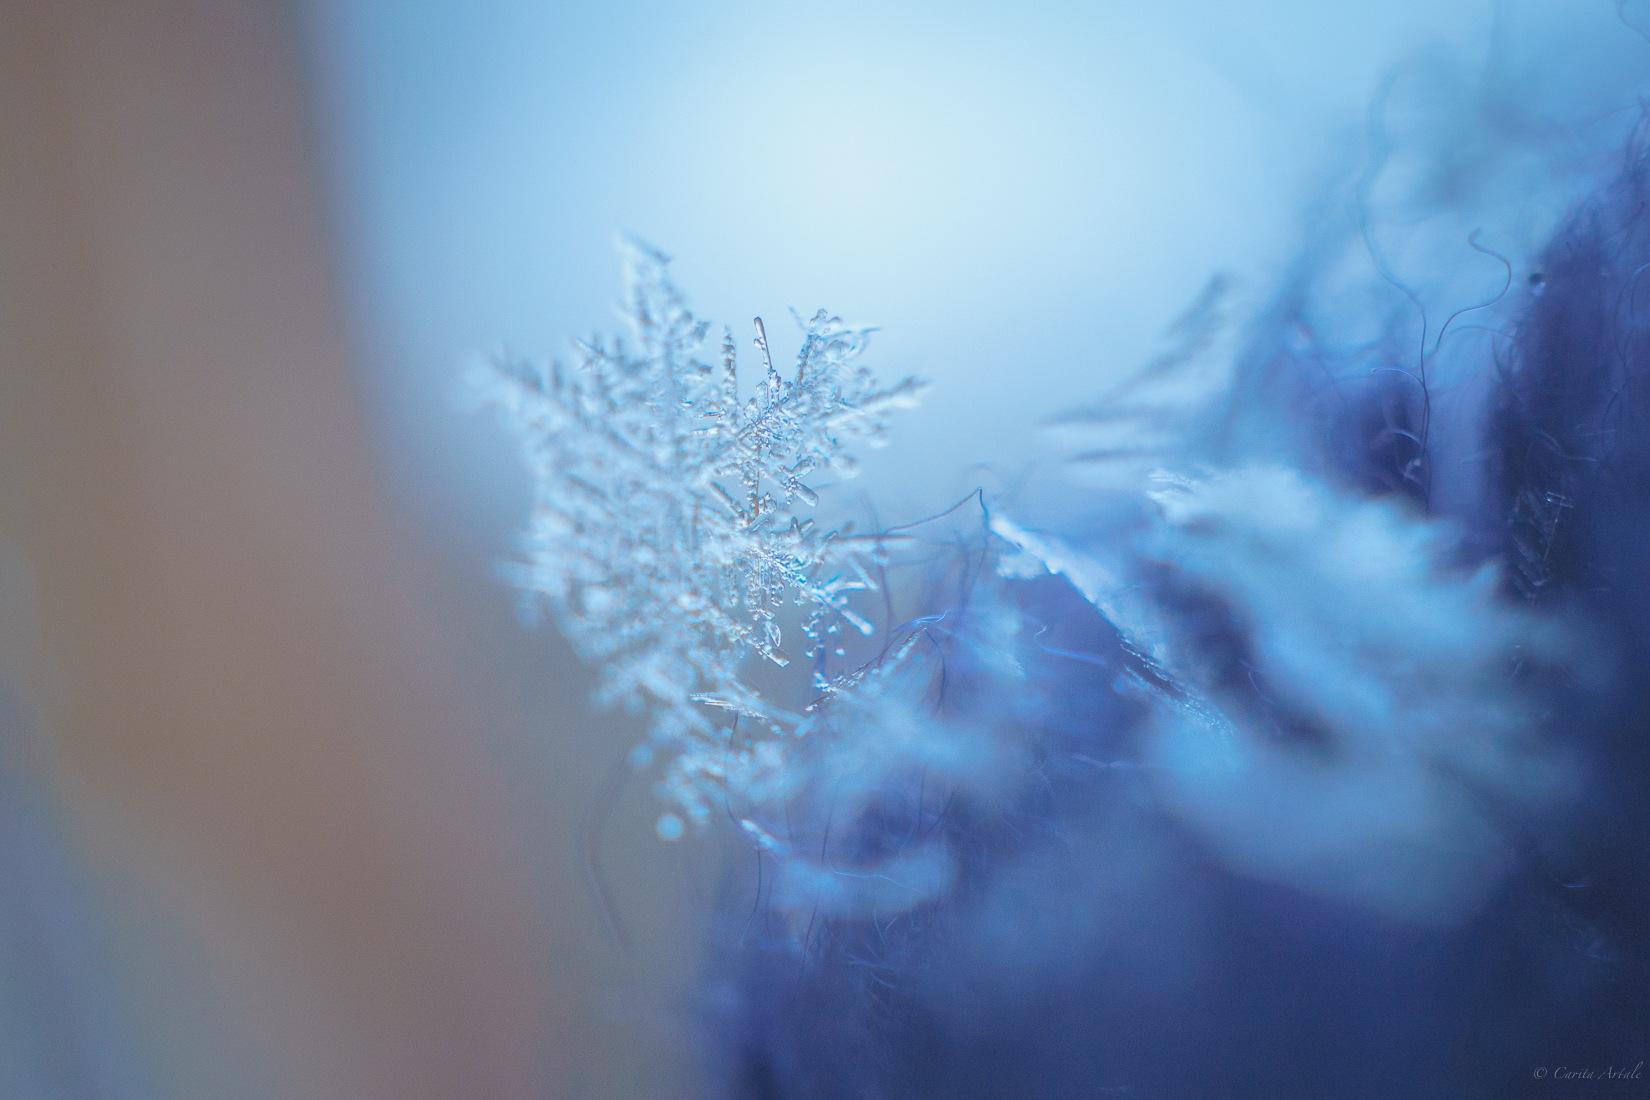 February cold by Carita